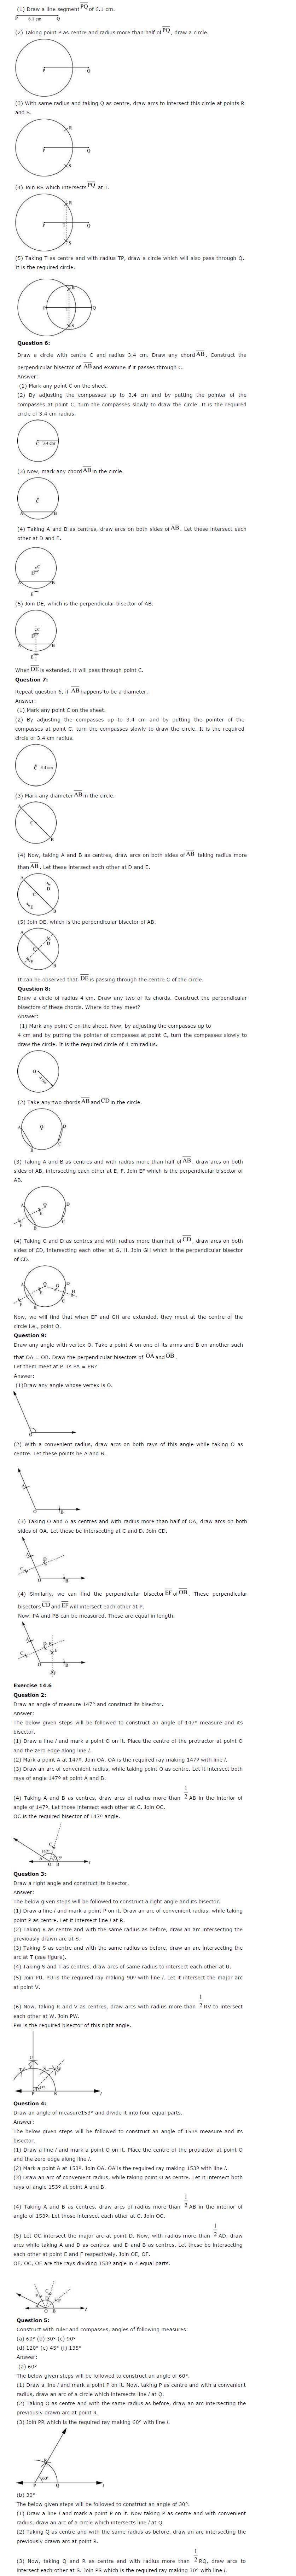 NCERT Solutions for Class 6th Maths 14 4